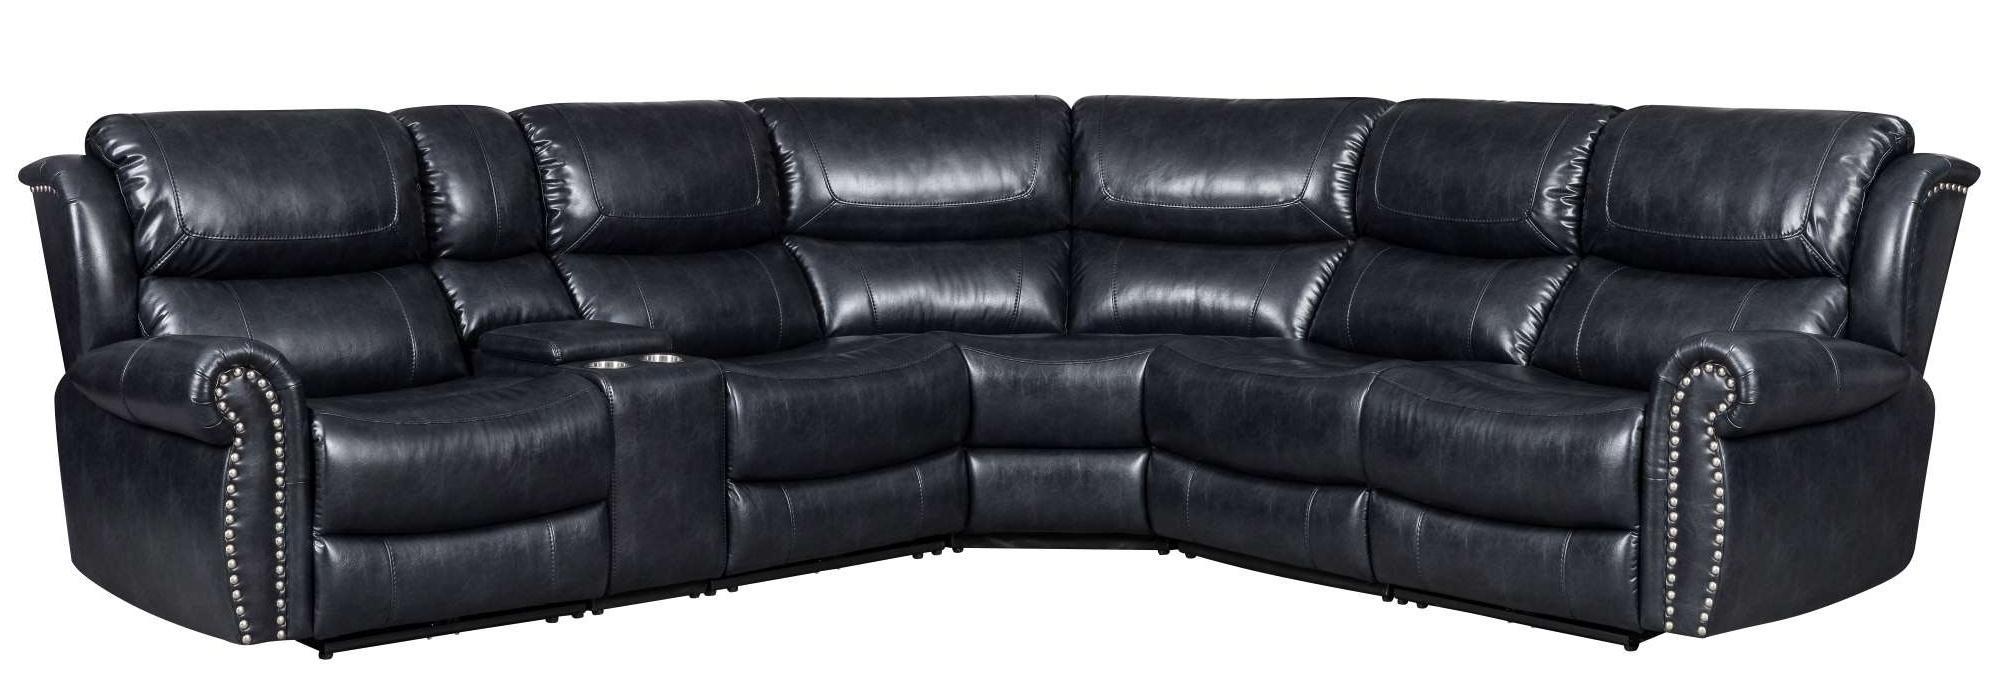 LRPX2509 6 Piece Modular Sofa